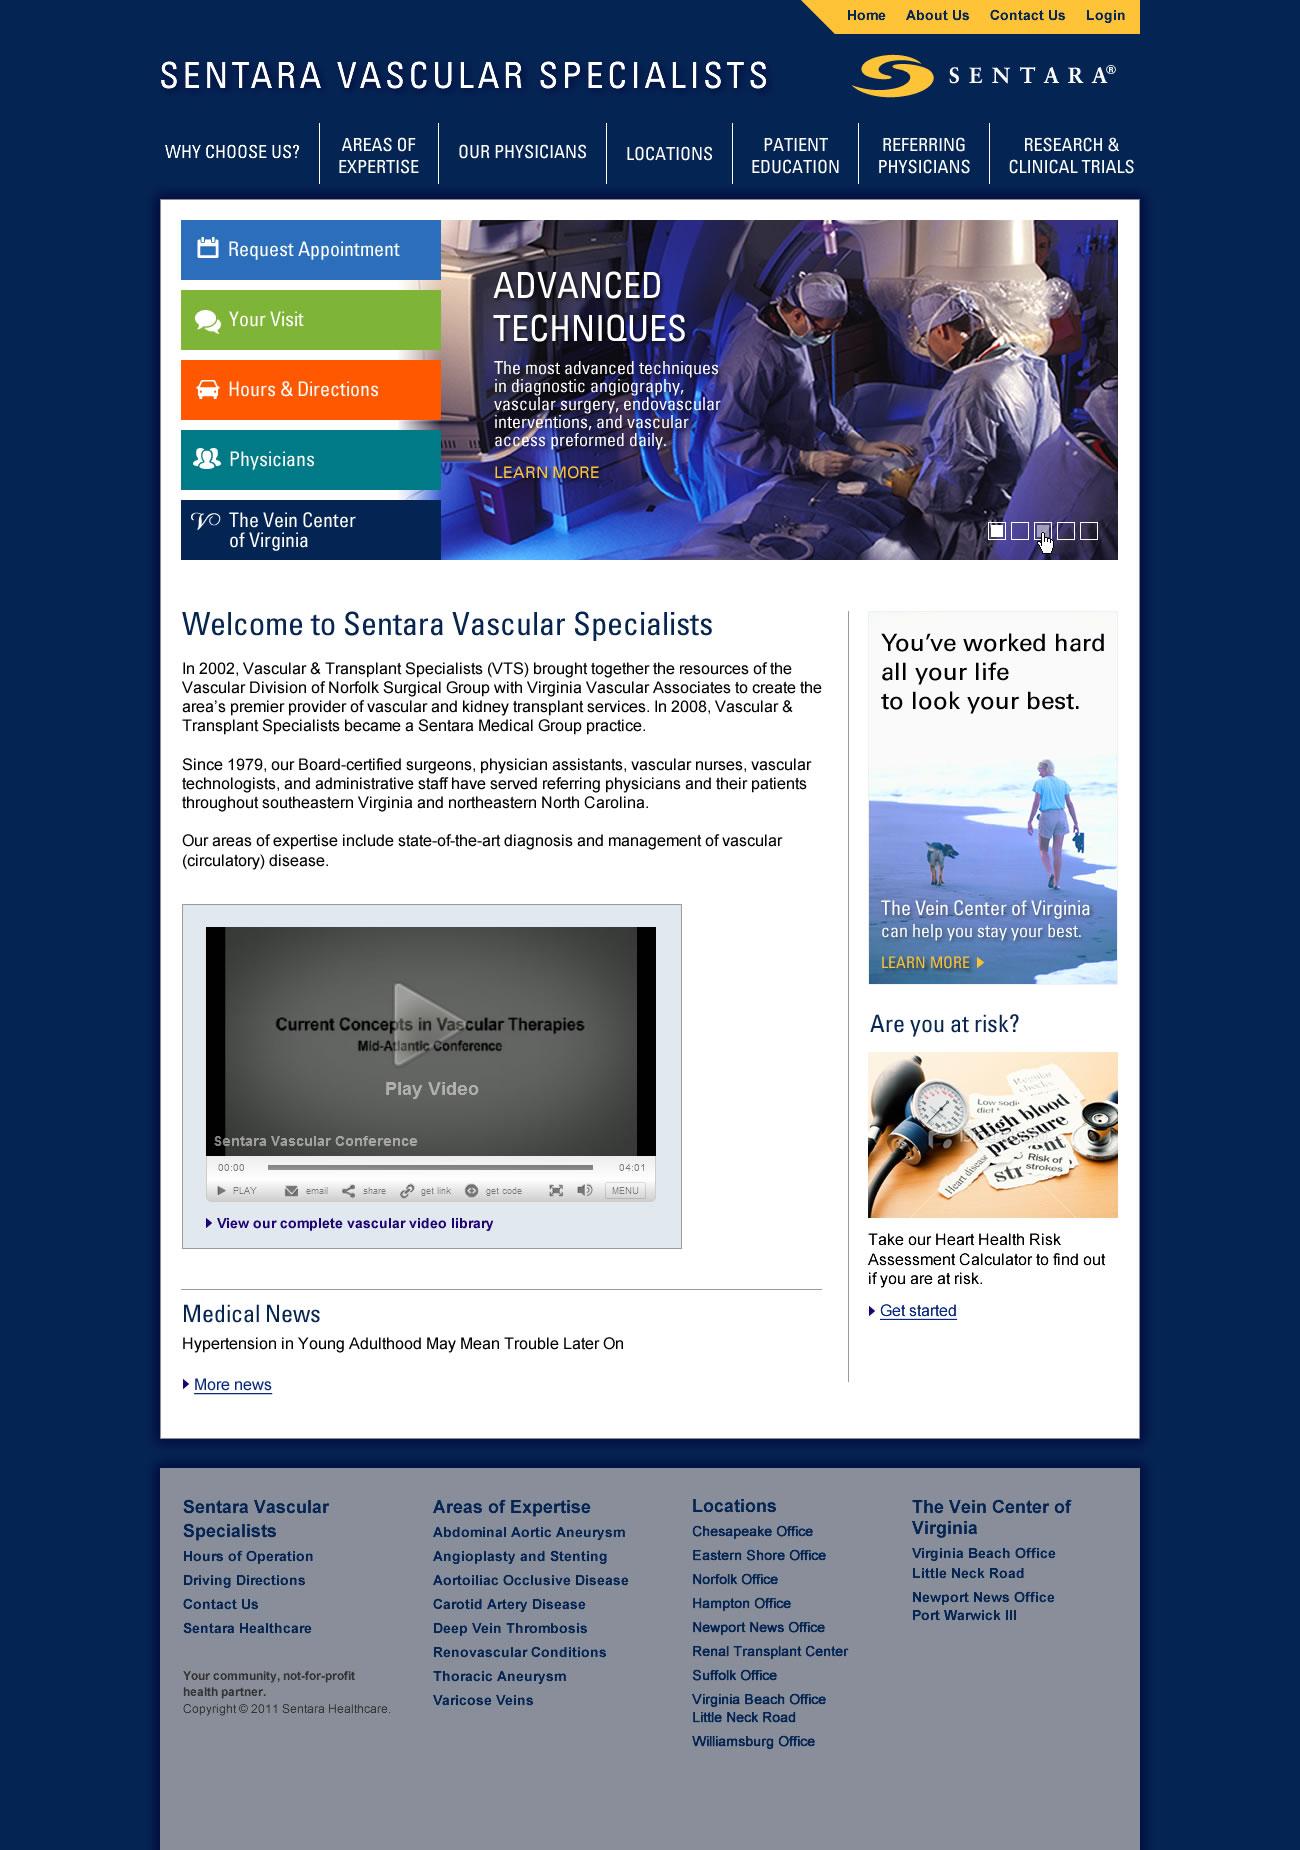 Sentara Vascular, Homepage